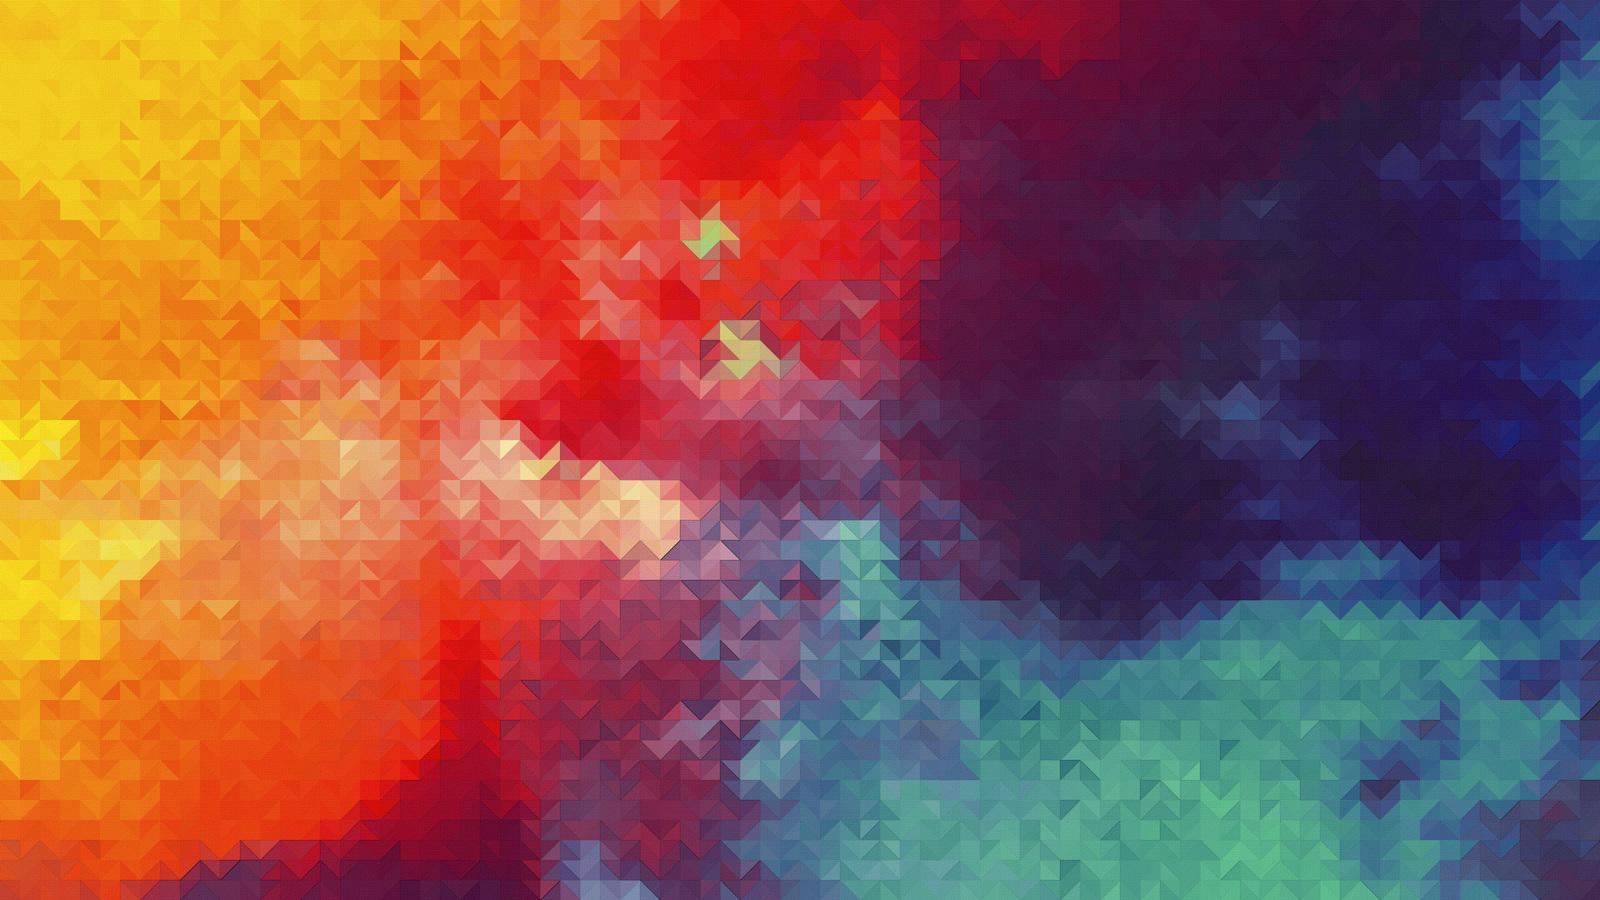 abstract-ink-4k-k5.jpg